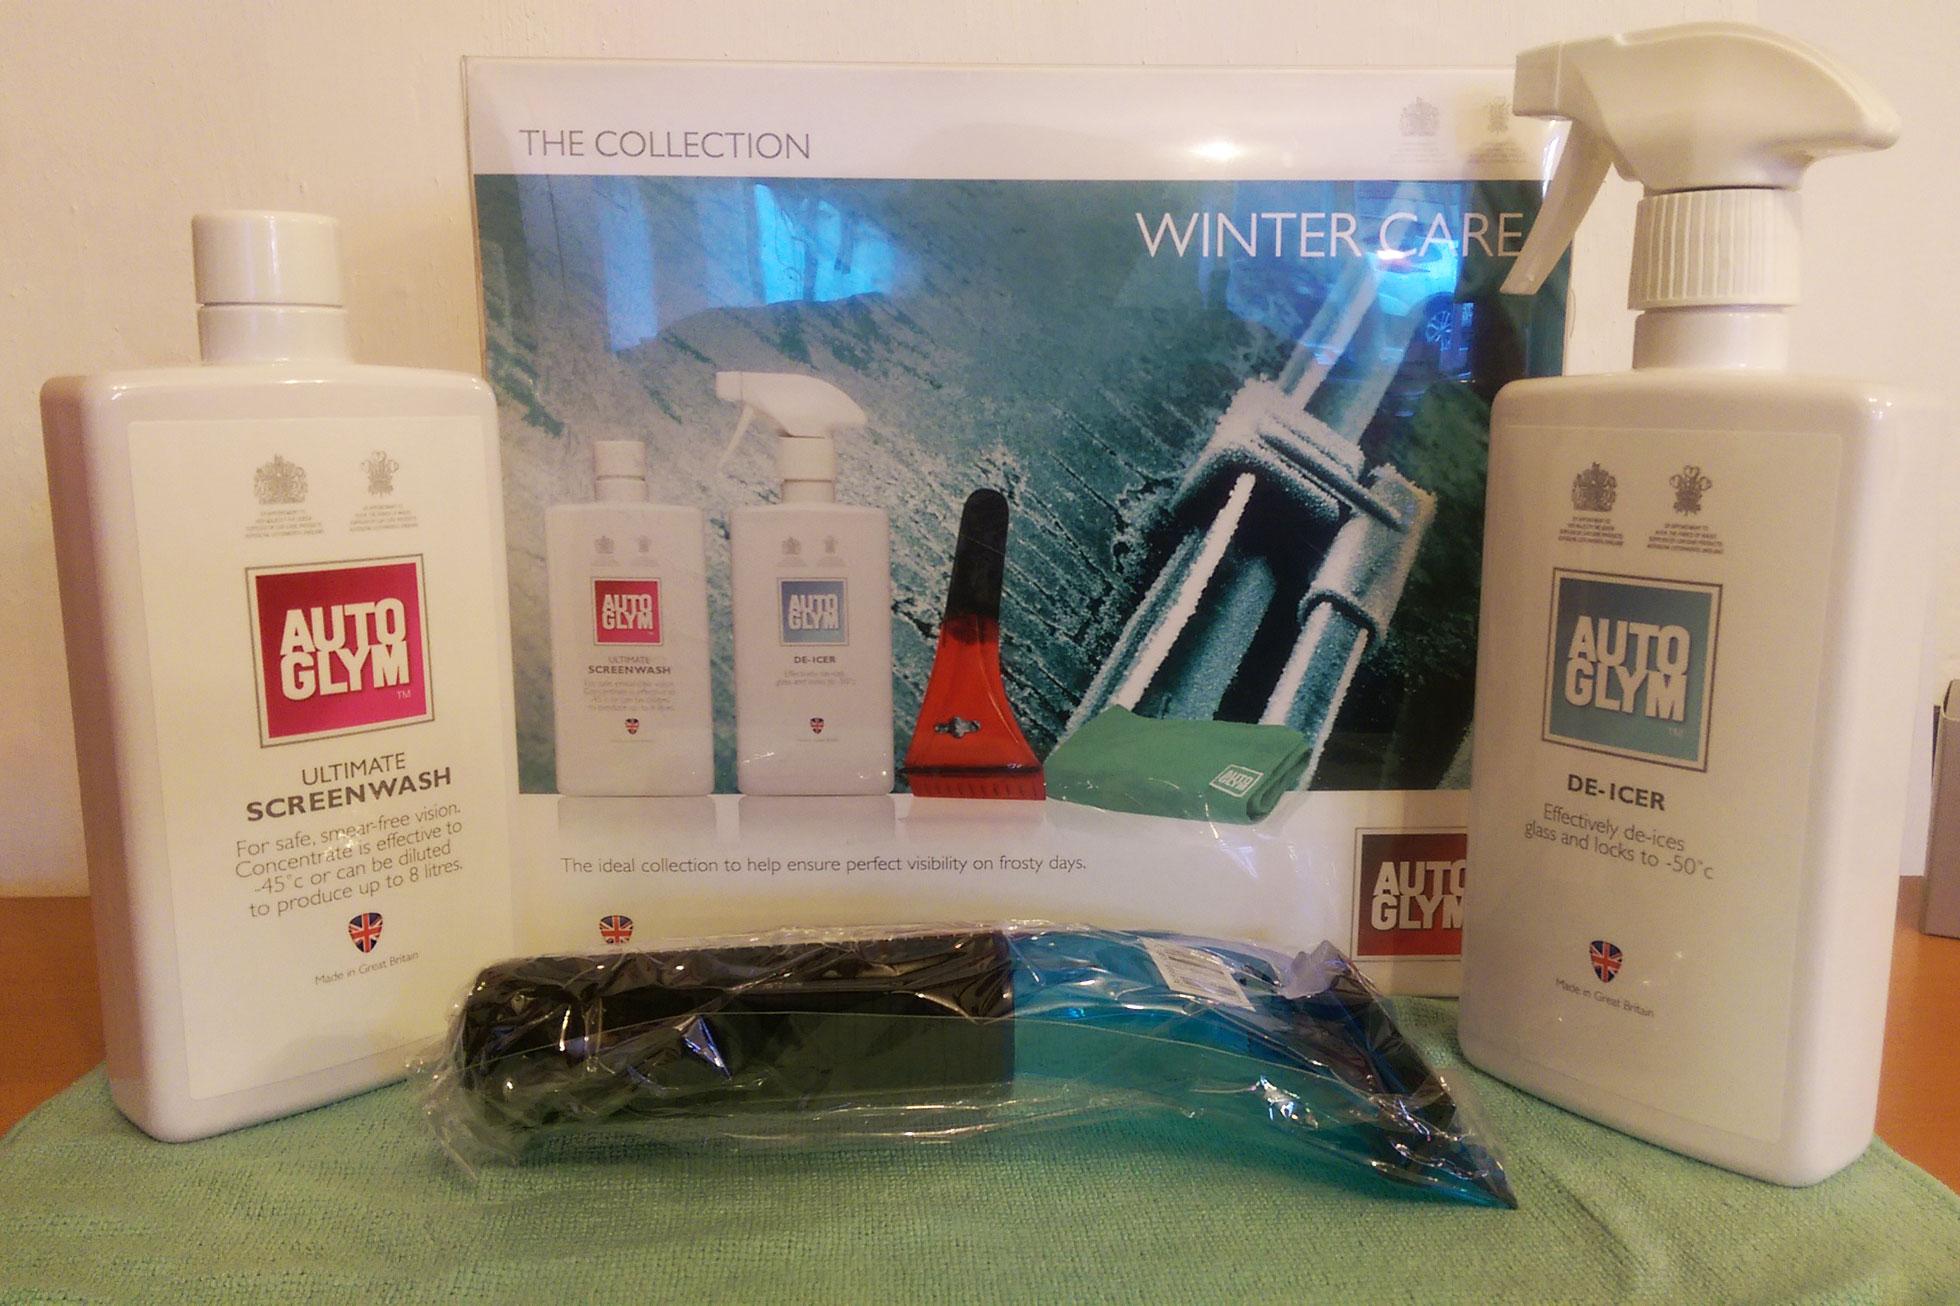 Win an Autoglym winter care kit